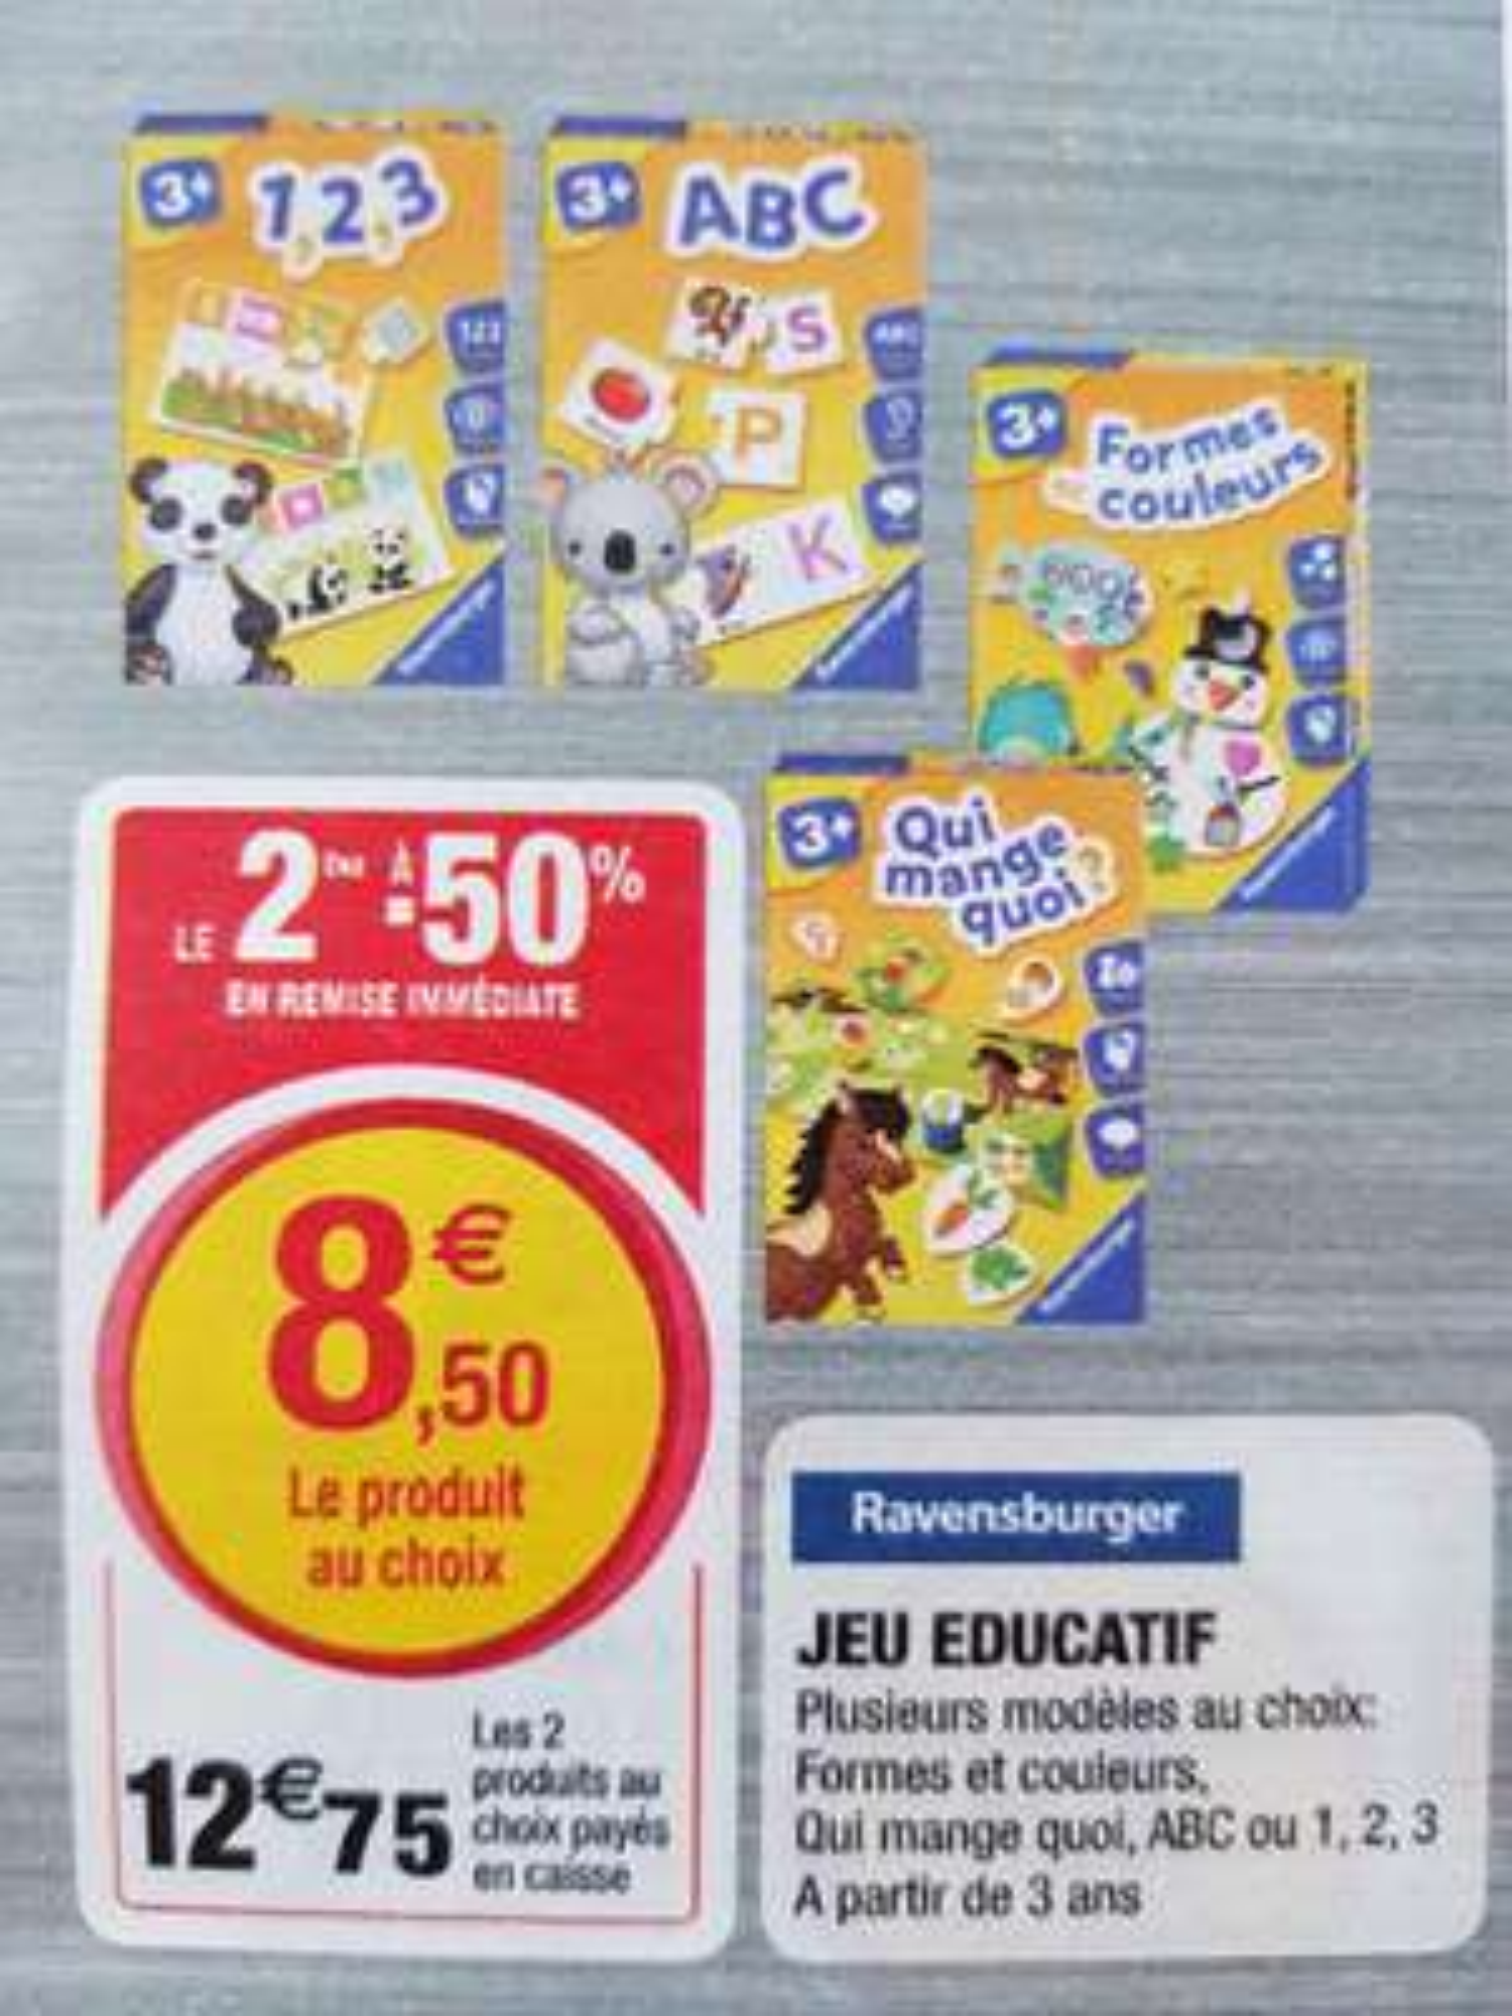 Lot de 2 jeux éducatifs Ravensburger (via ODR) - Hyper U